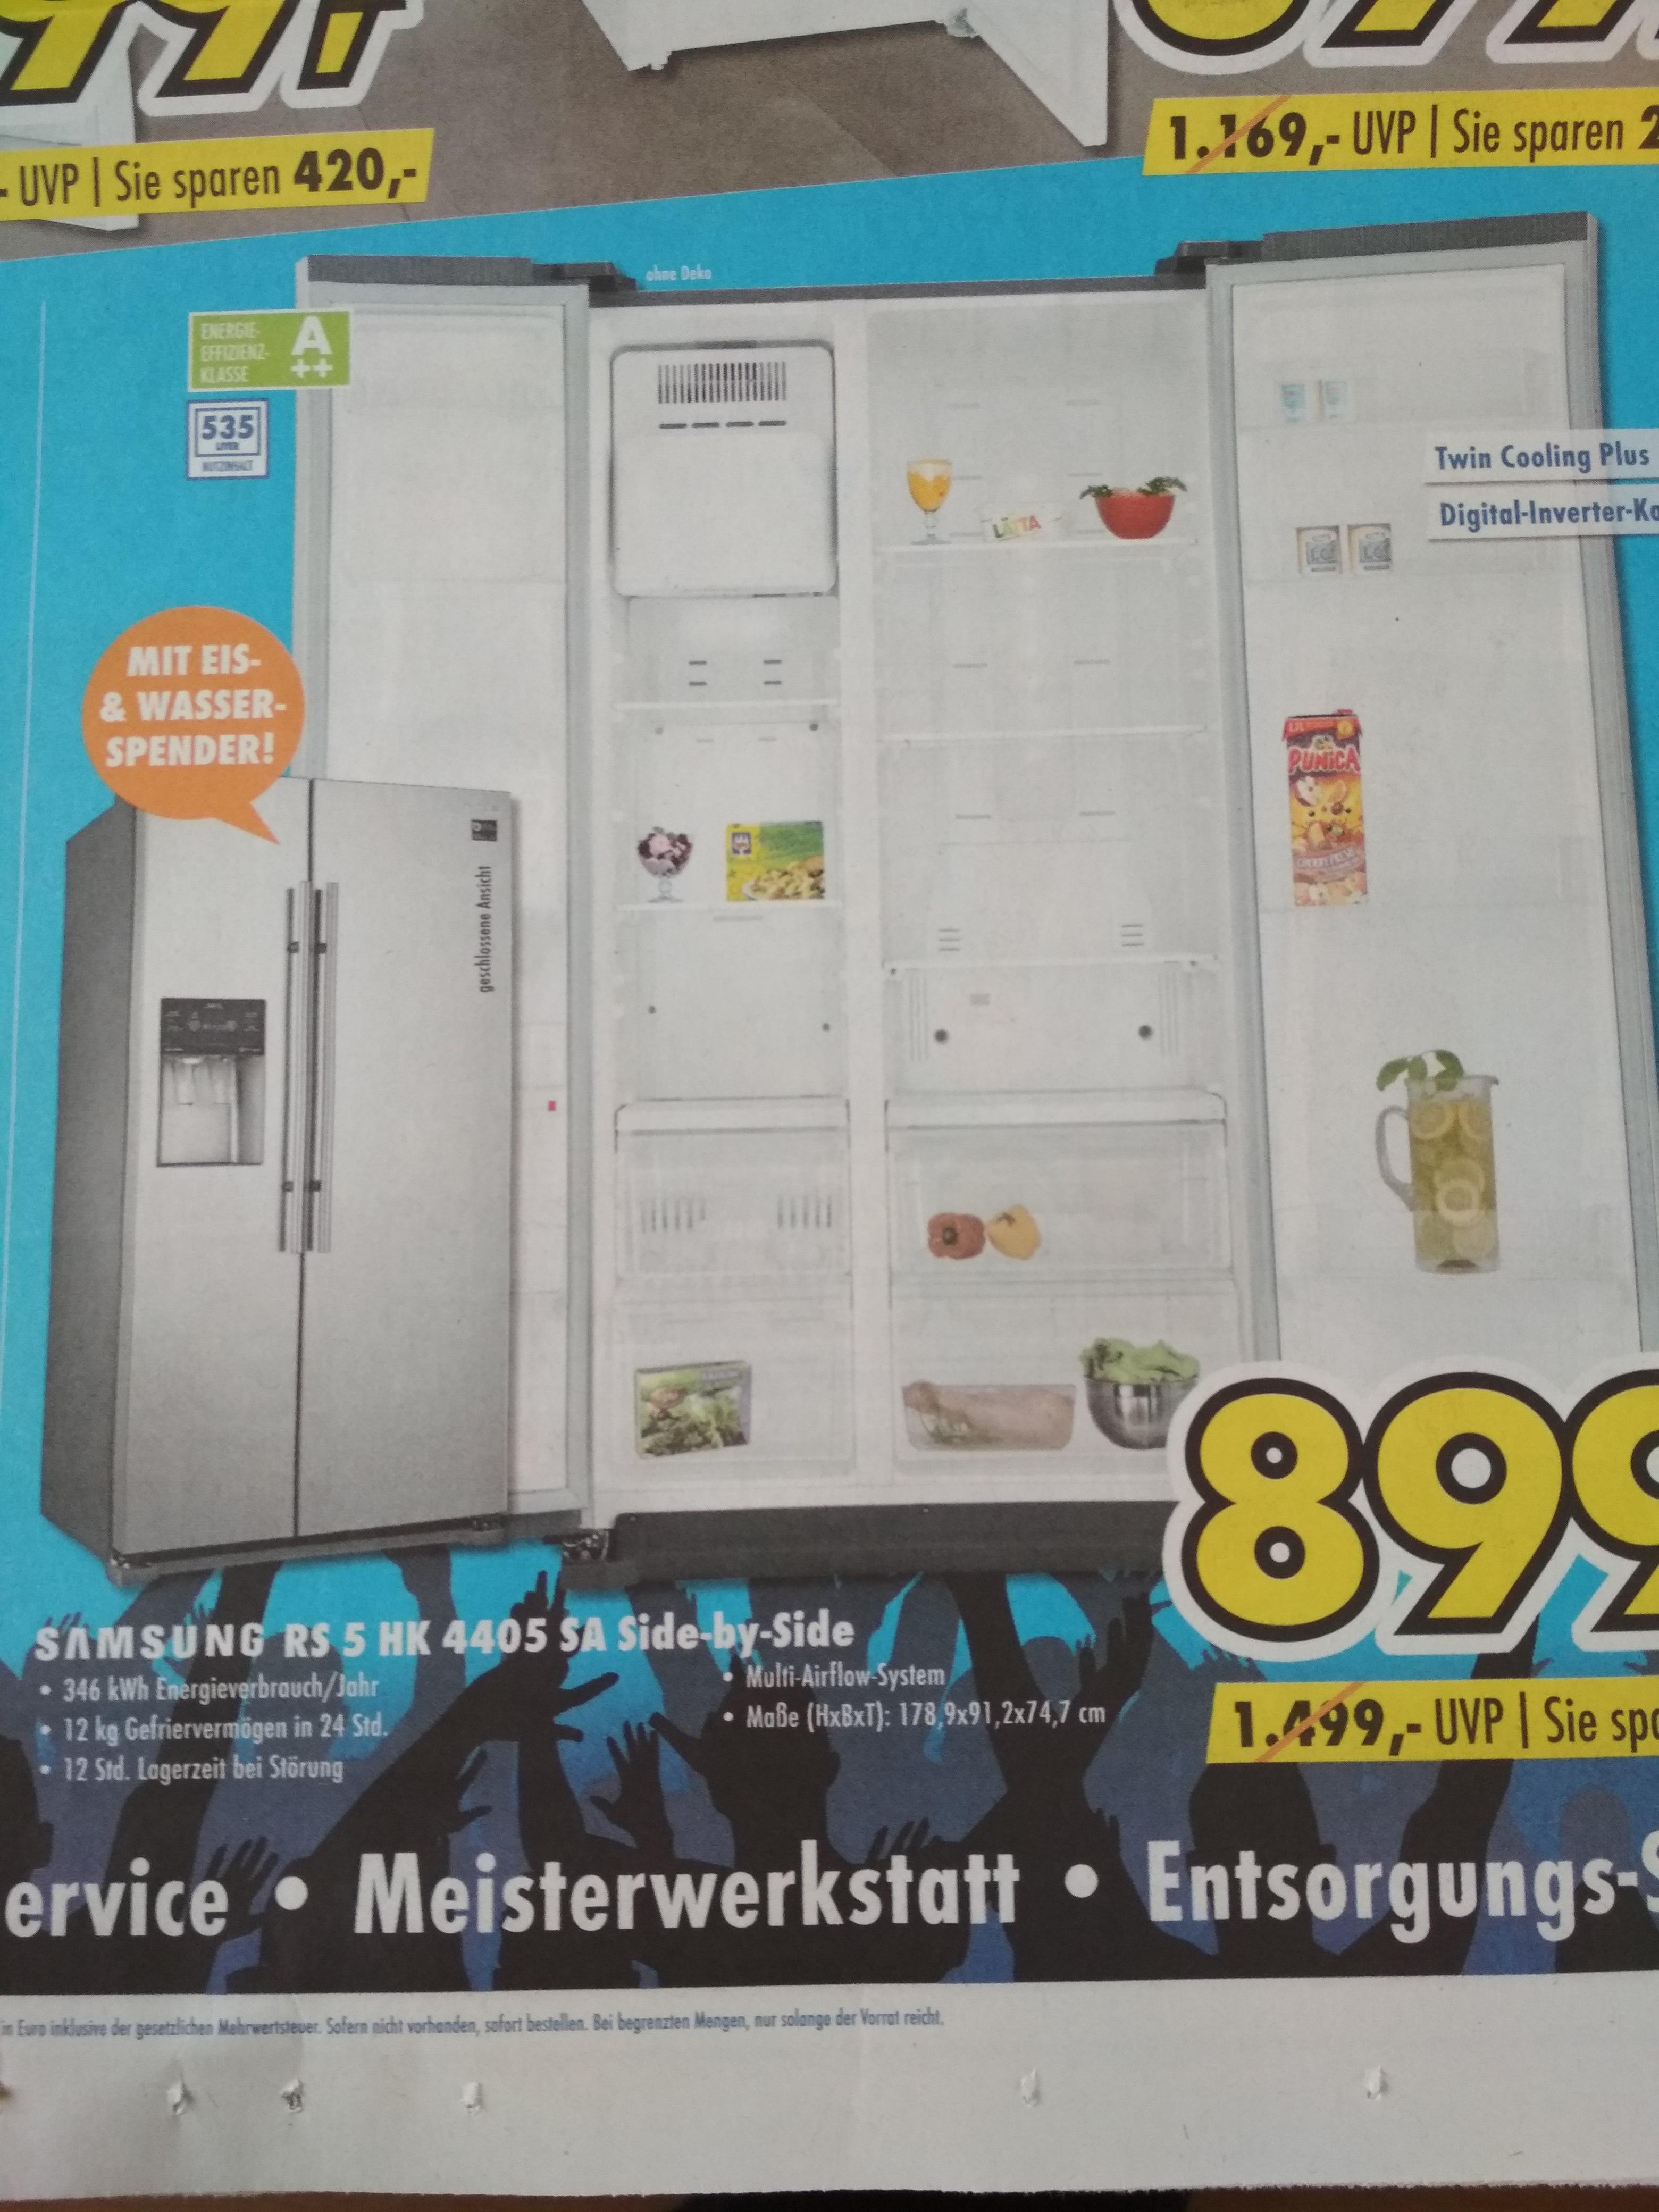 (Lokal) Euronics Meppen + Fürstenau Samsung RS5HK4405SA Side by Side Kühlschrank für 899€ statt 1099€